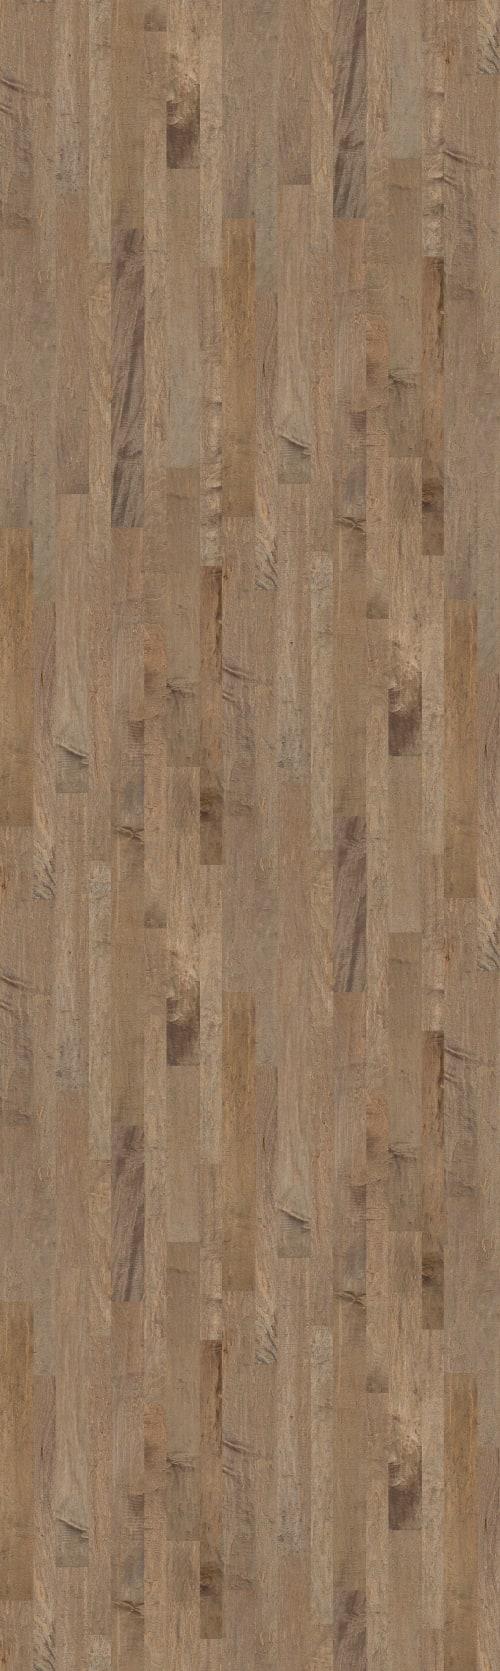 Bennington Maple in Highway - Hardwood by Shaw Flooring